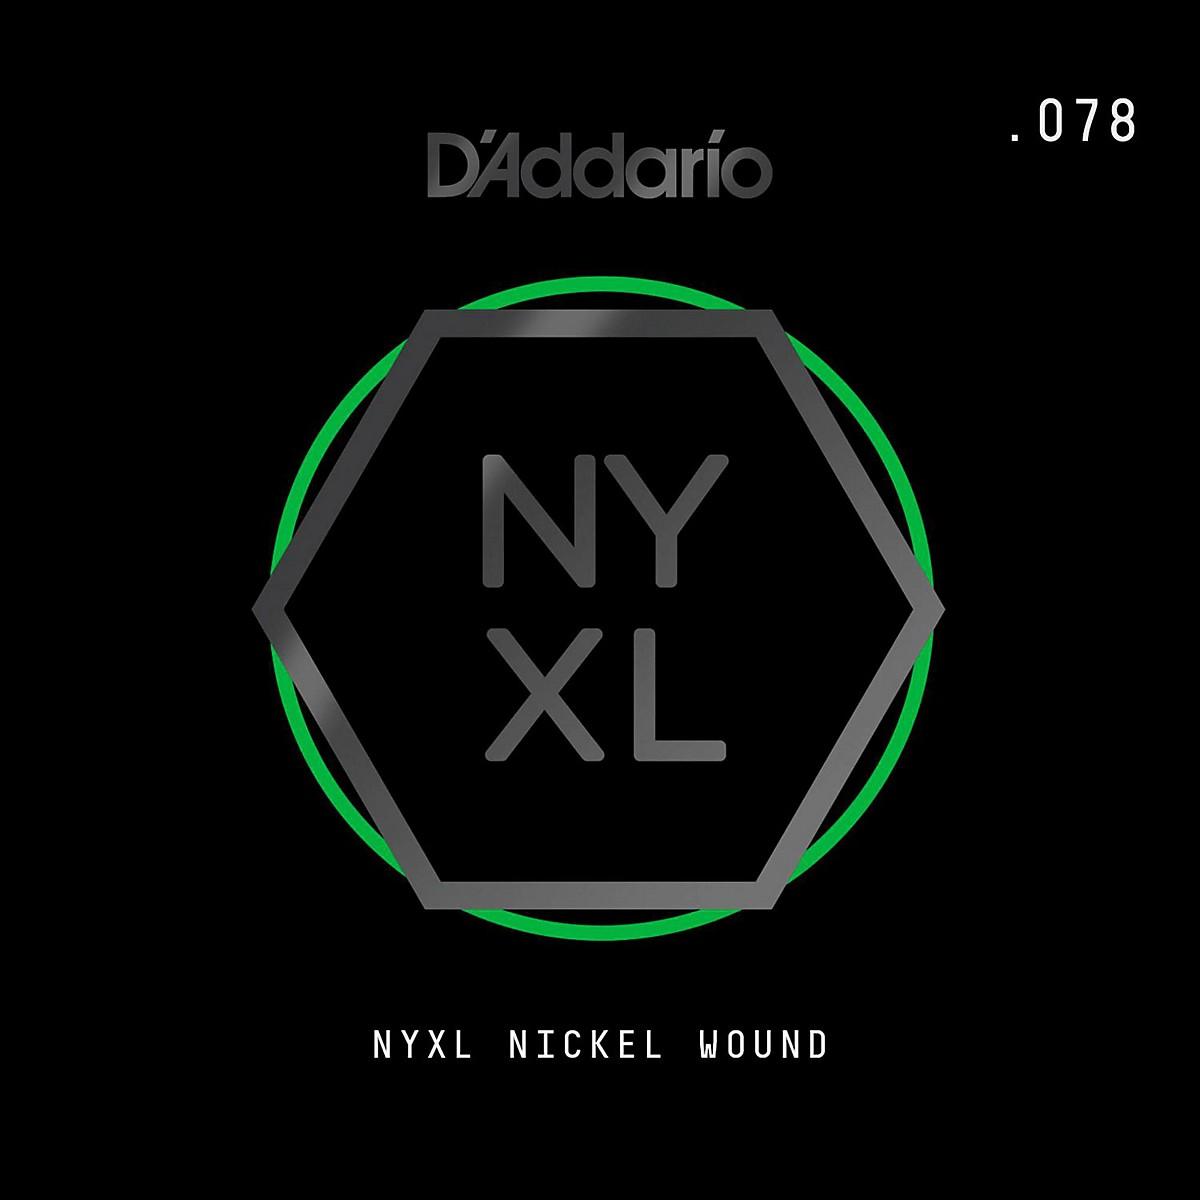 D'Addario NYNW078 NYXL Nickel Wound Electric Guitar Single String, .078